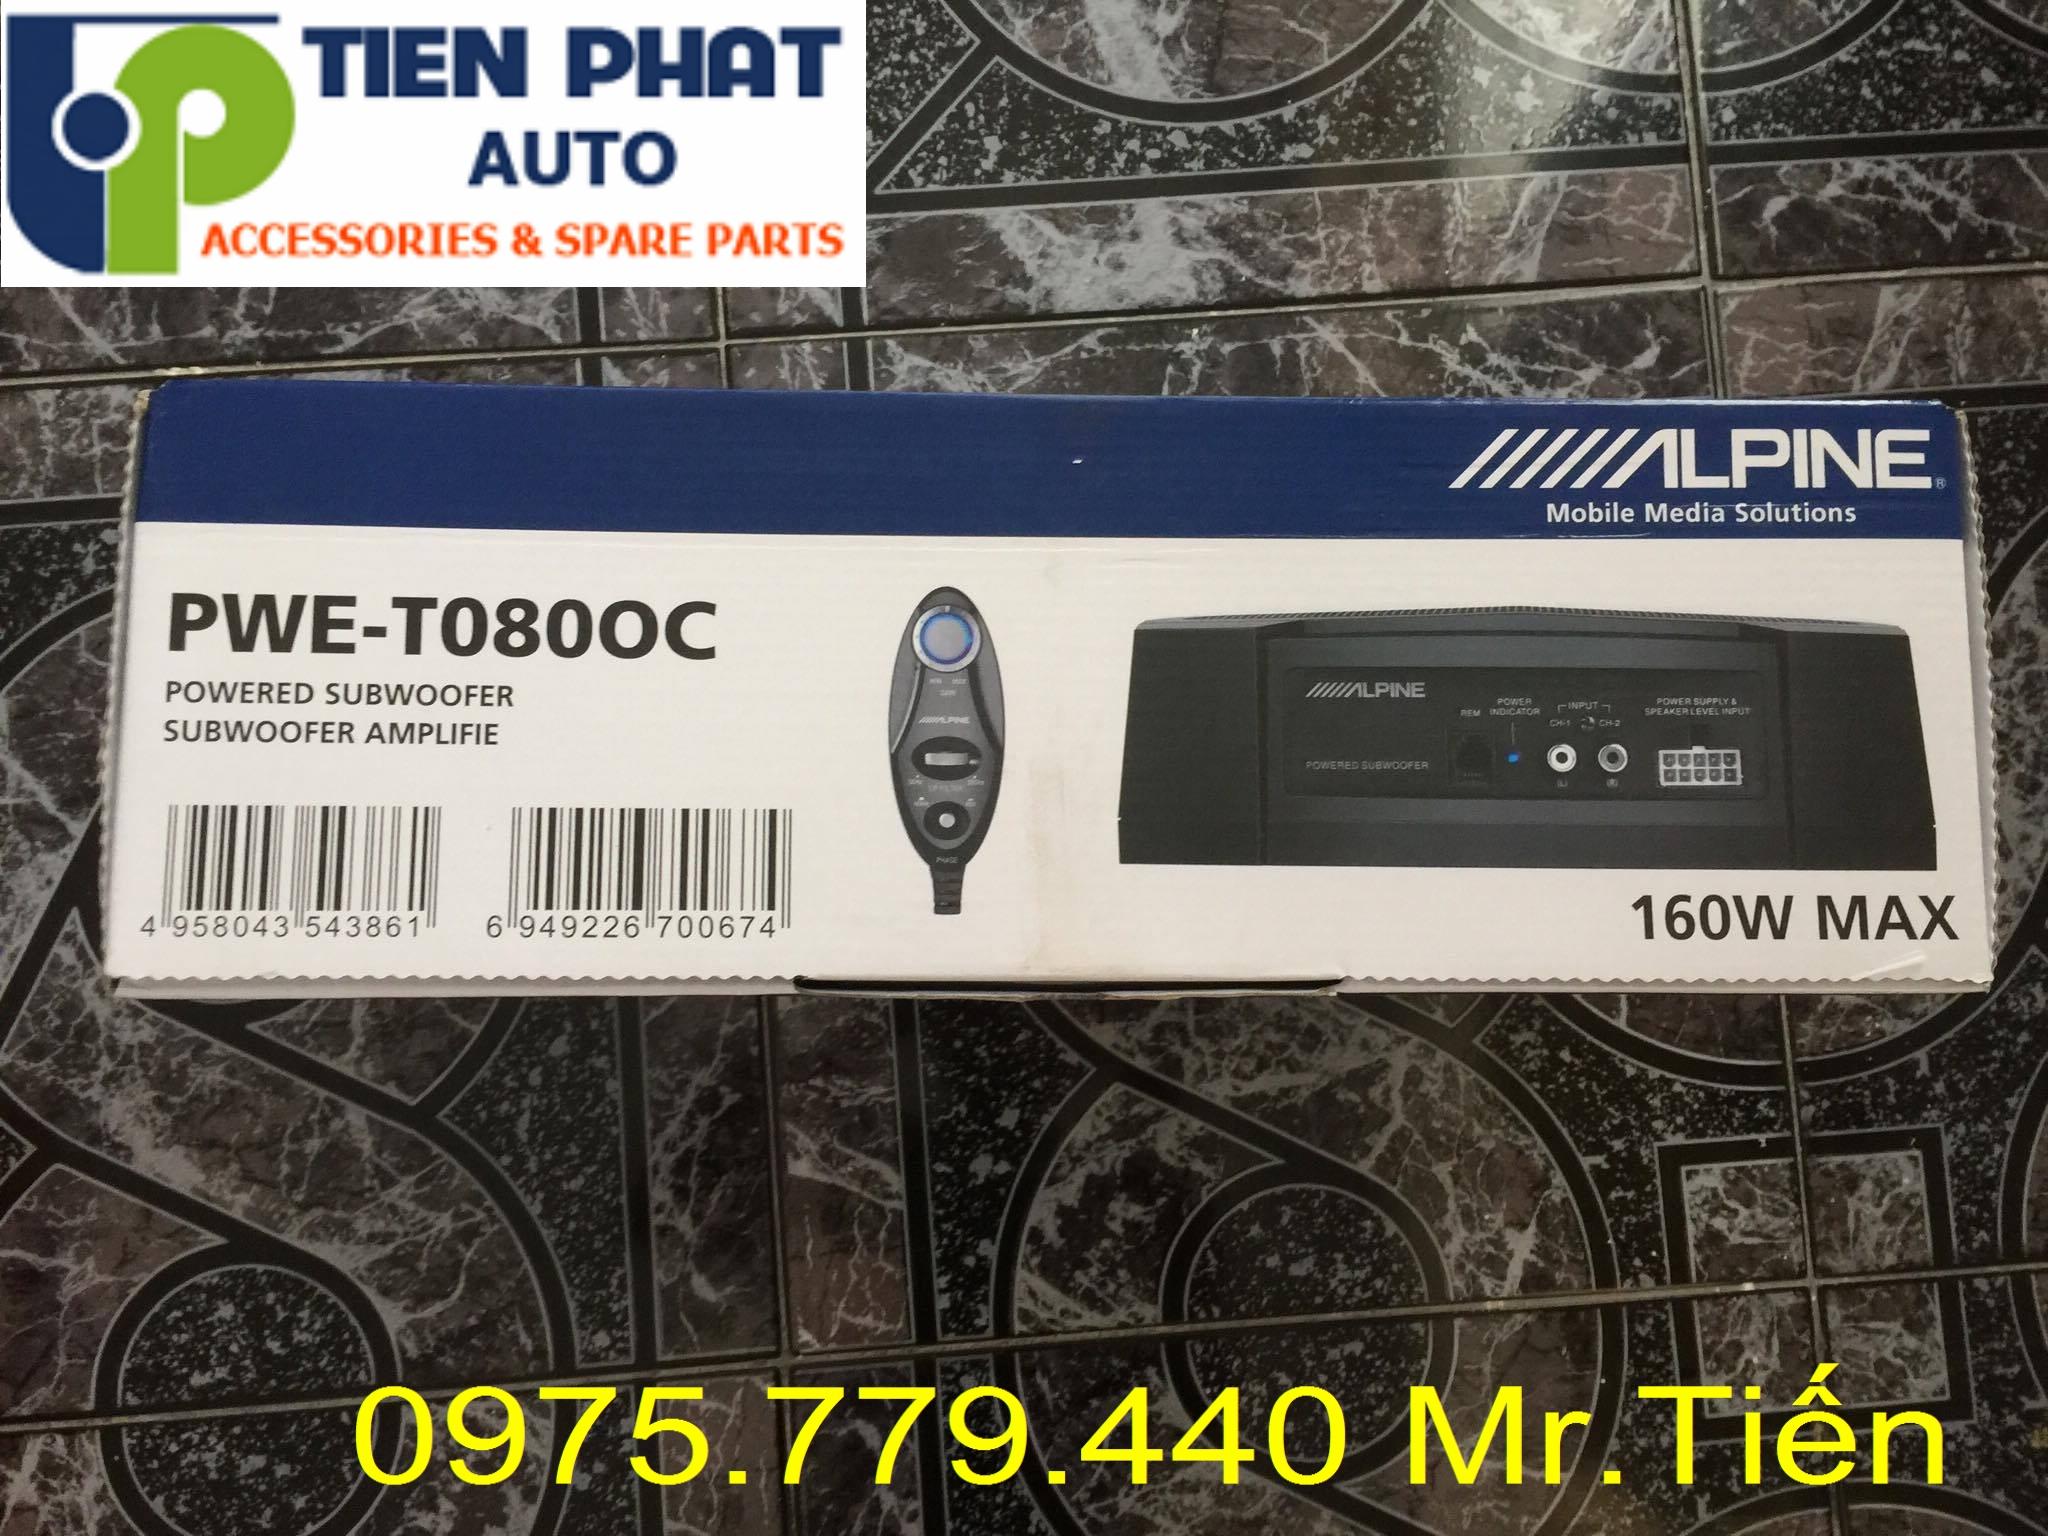 Lắp Loa sub Alpine PWE-T0800C cho Chevrolet Spack Lắp Đặt Tận Nơi